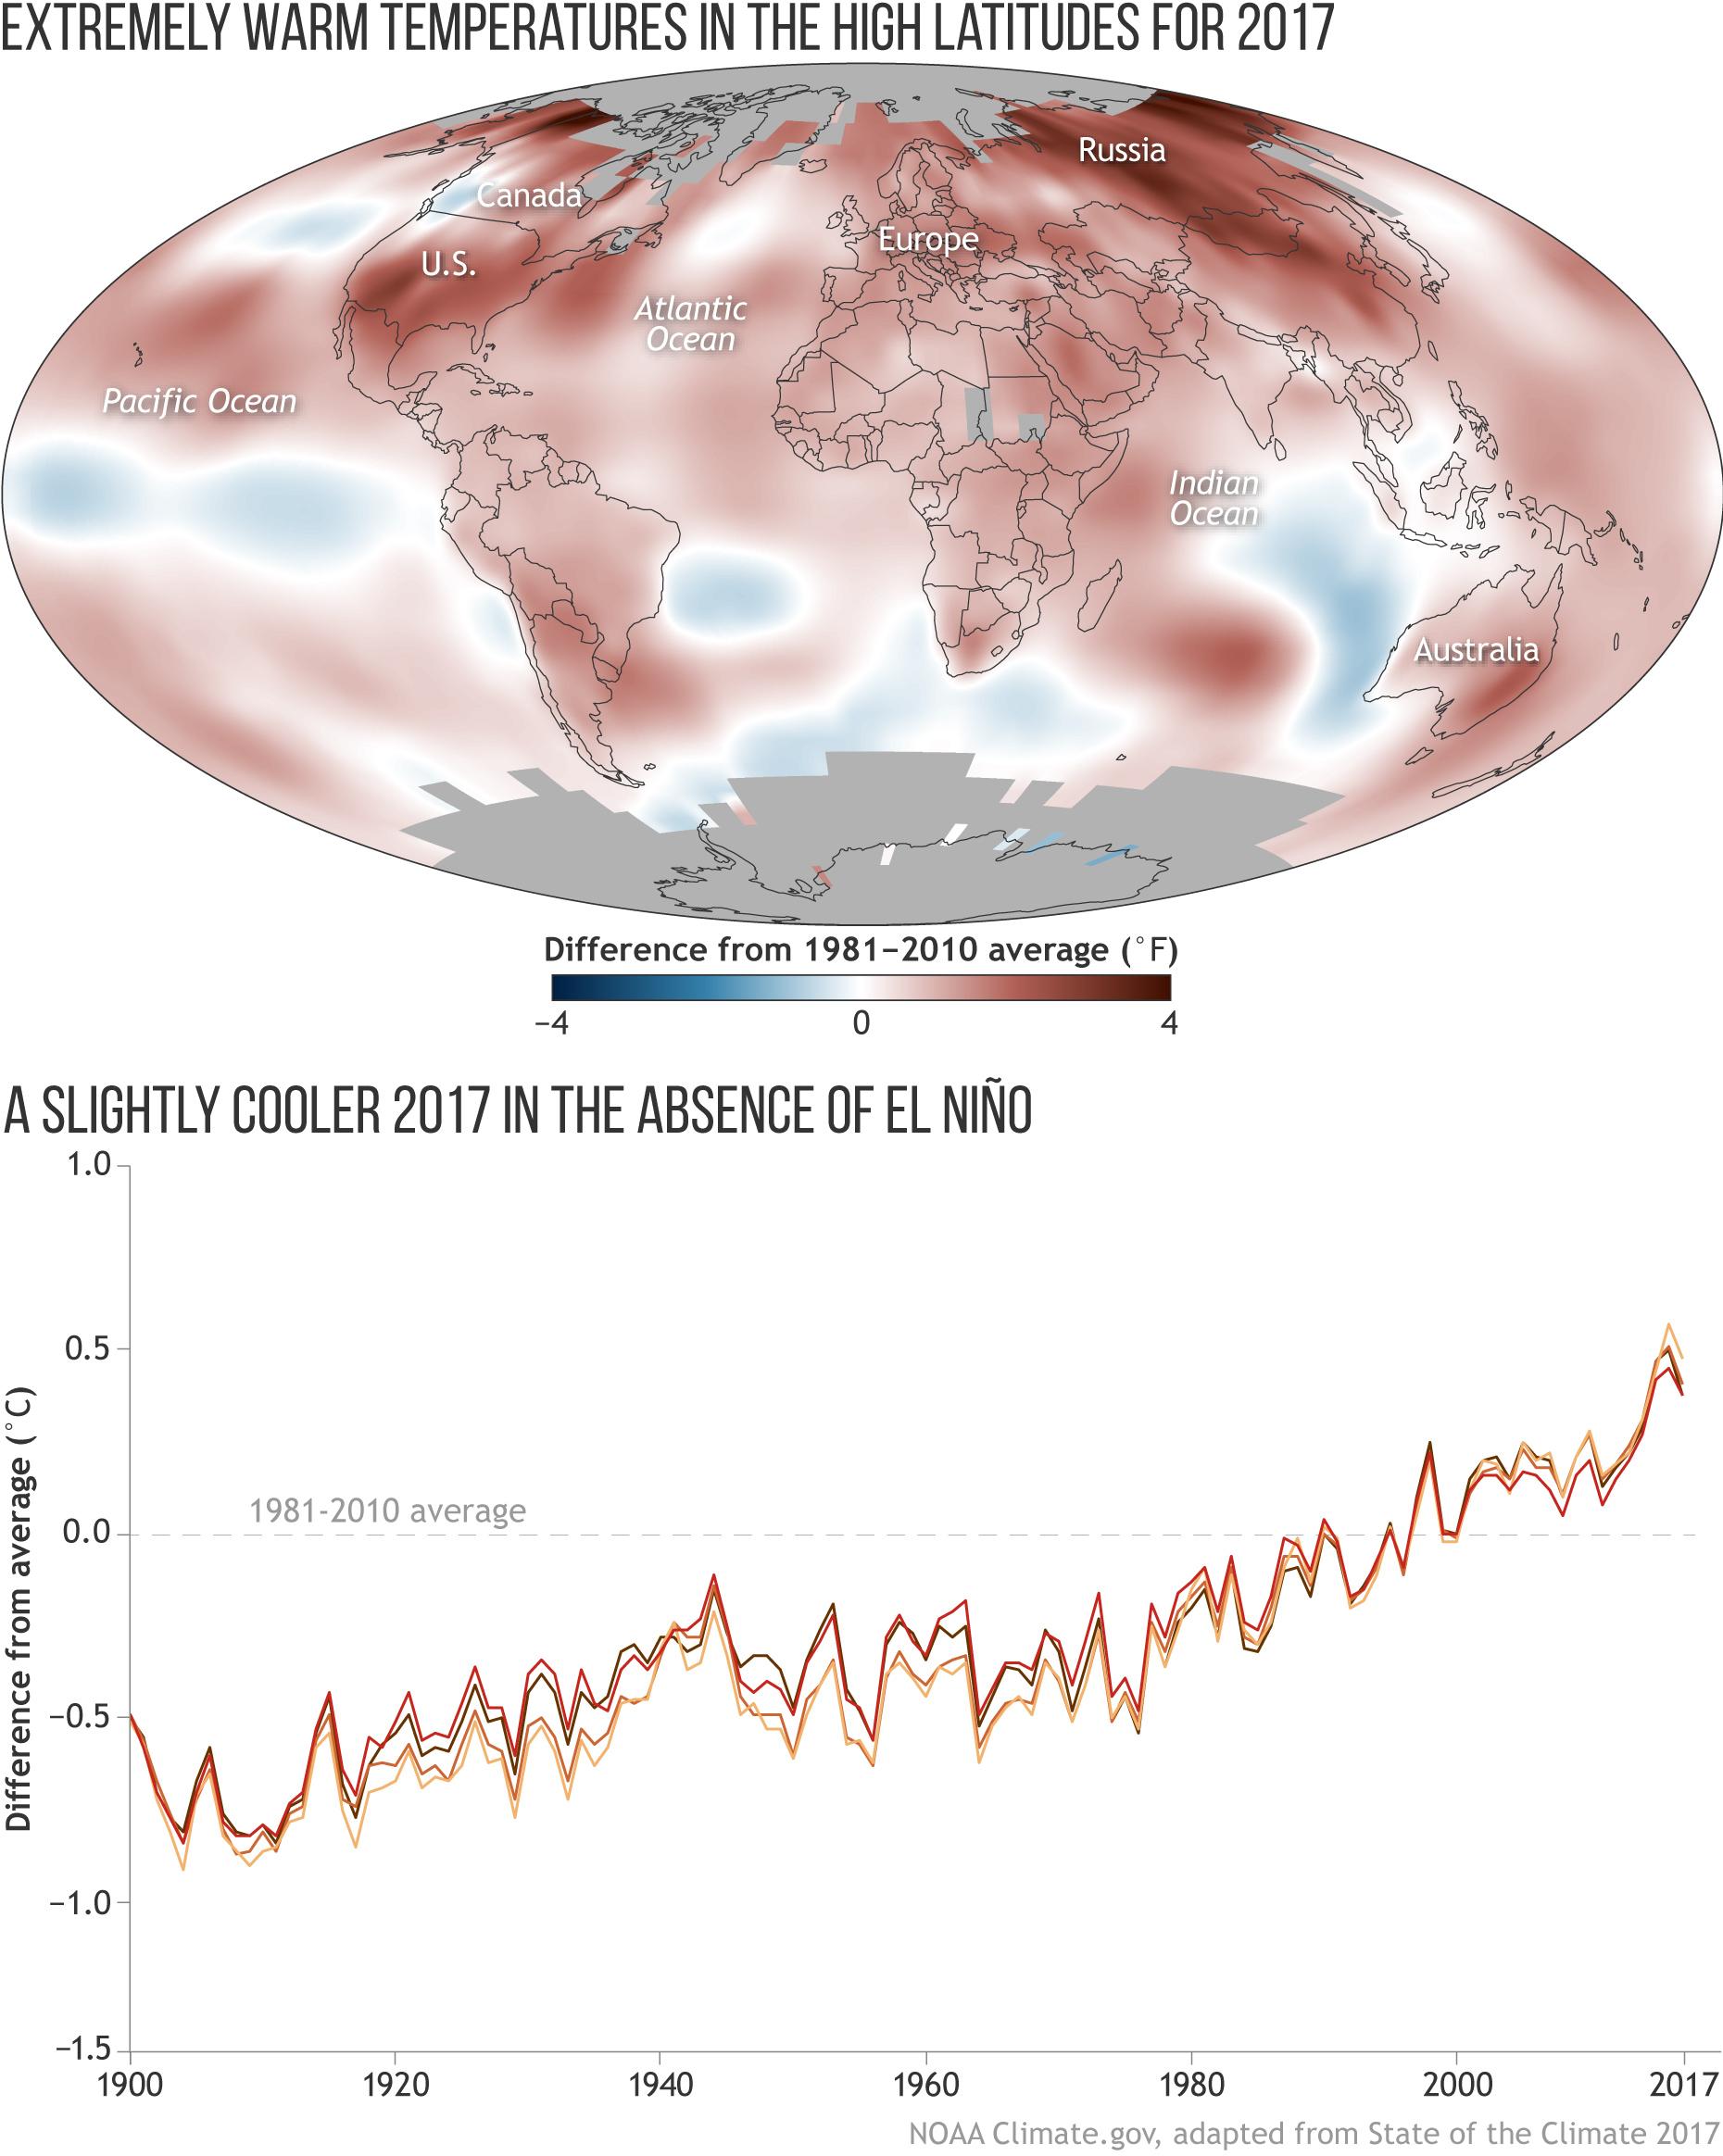 https://www.climate.gov/sites/default/files/SotC2017_01_GlobalSurfaceTemps_combo_large.jpg